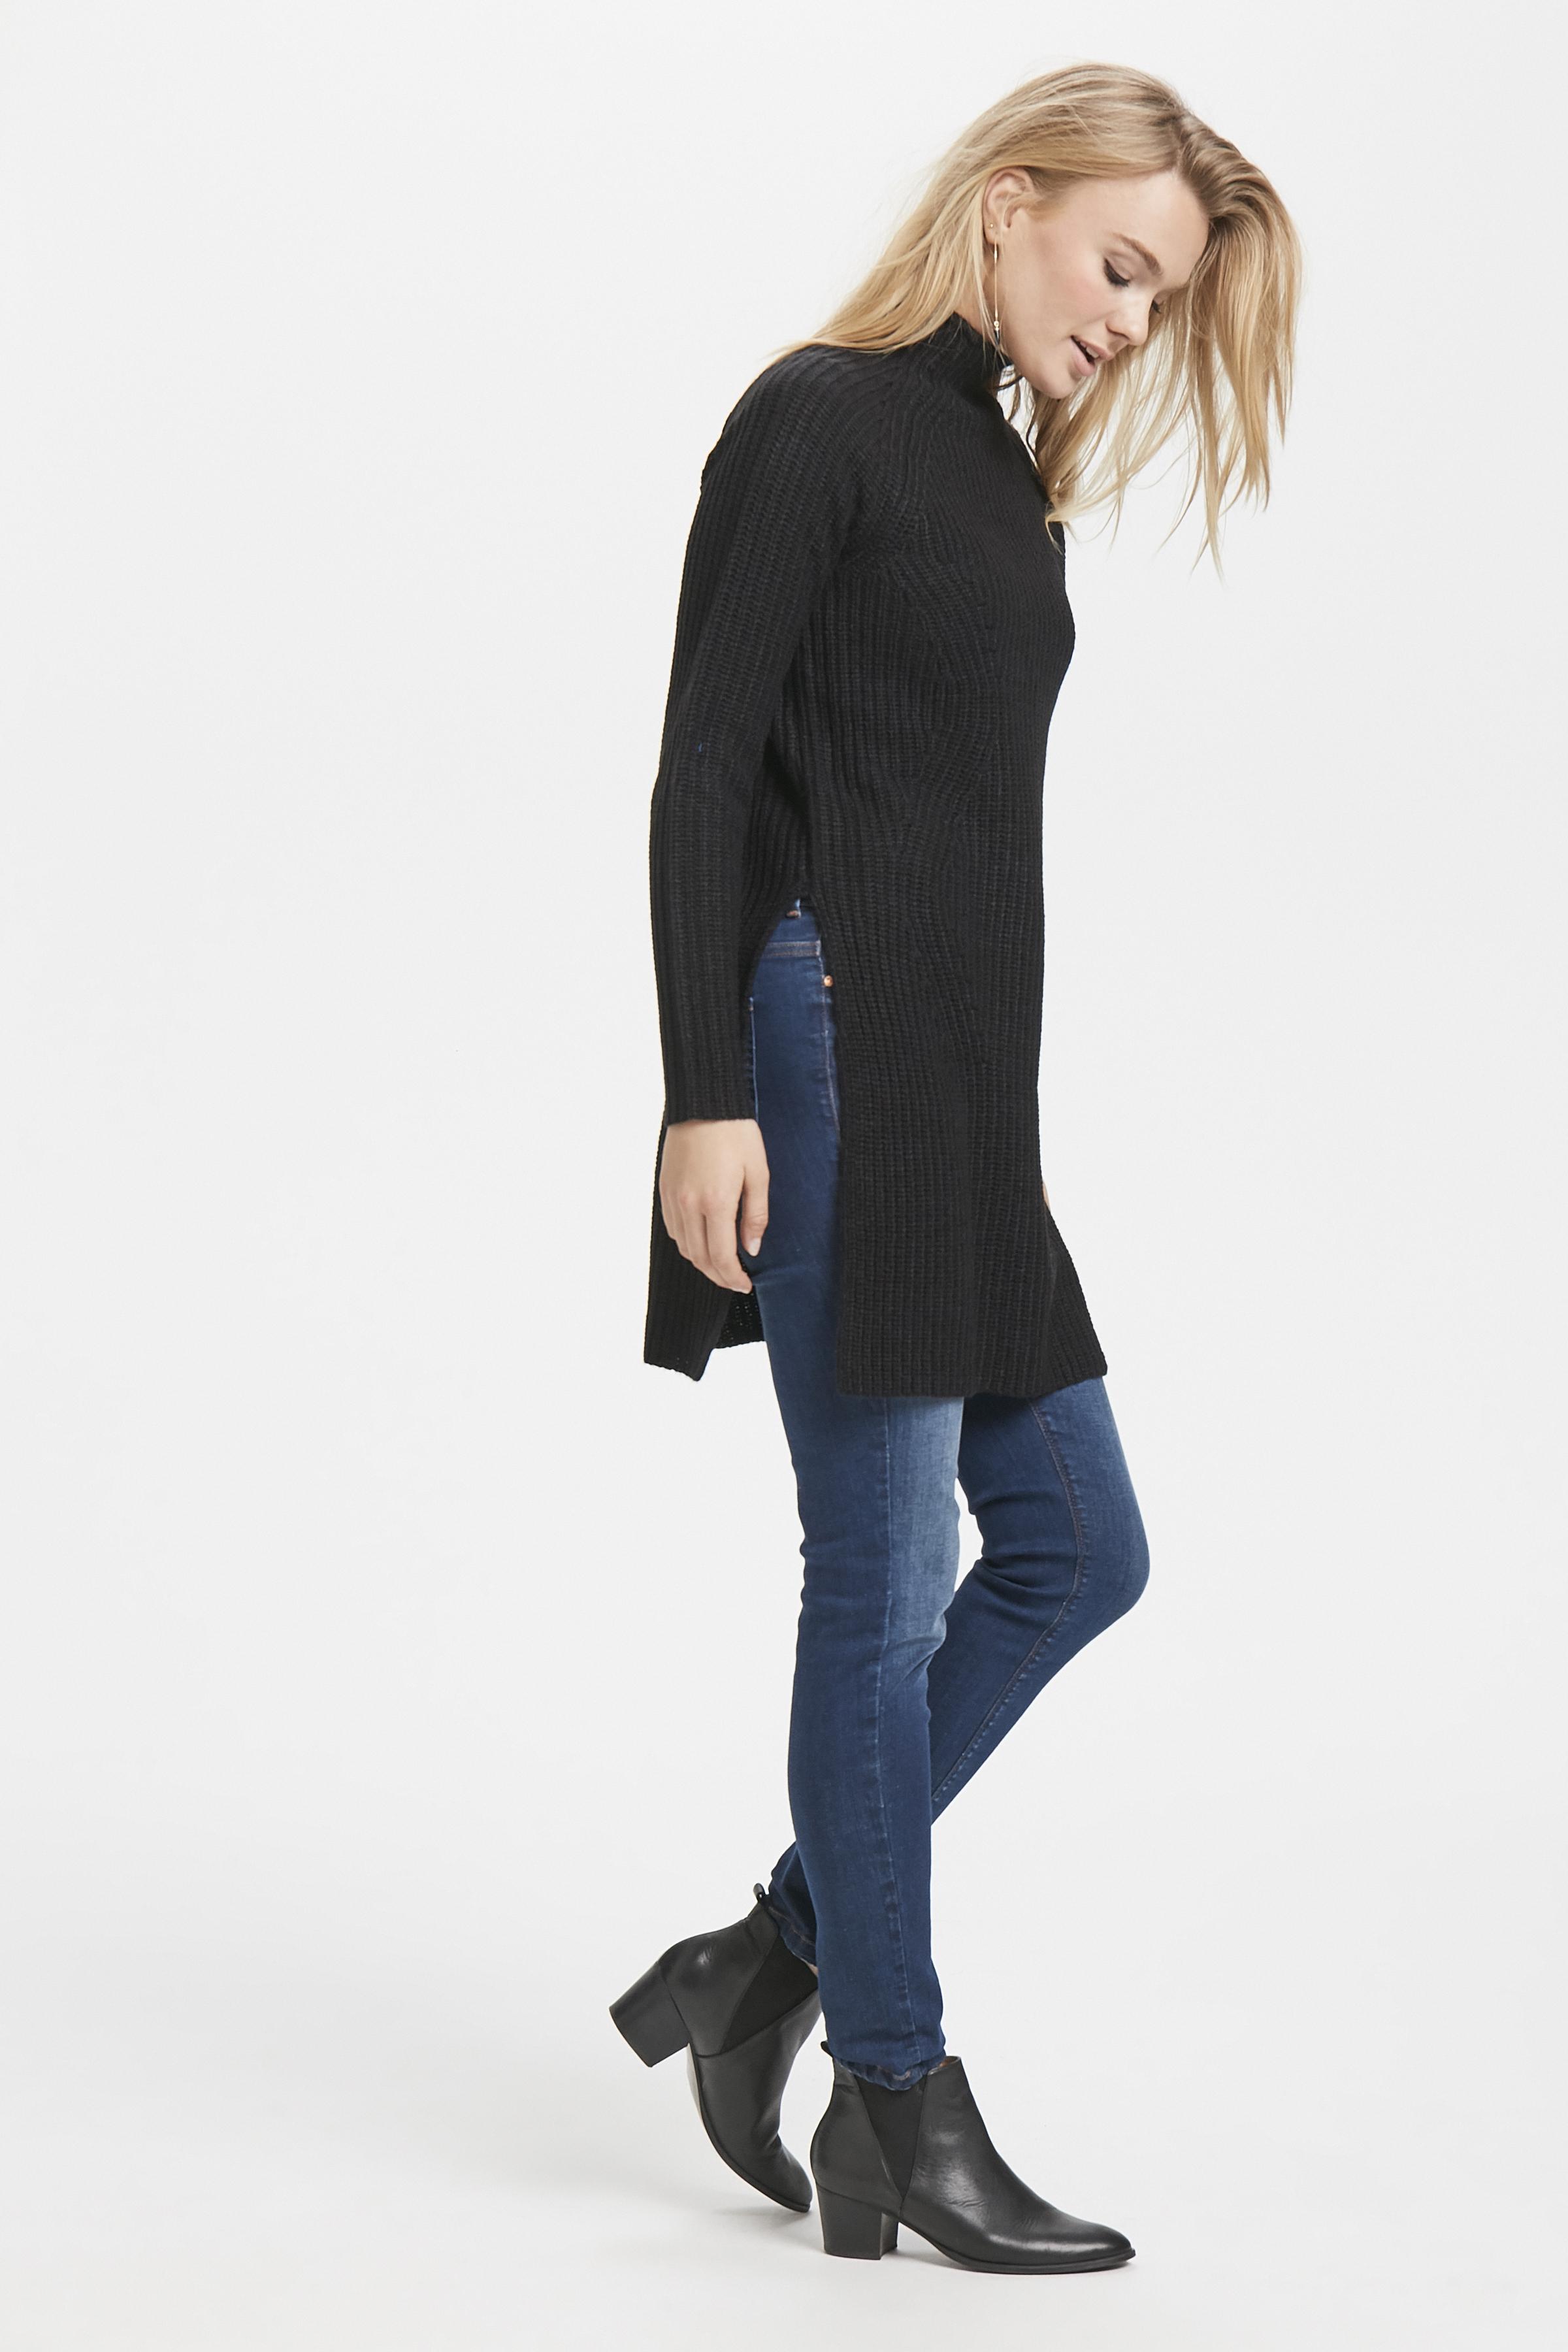 Svart Stickad tunika från b.young – Köp Svart Stickad tunika från stl. XS-XXL här